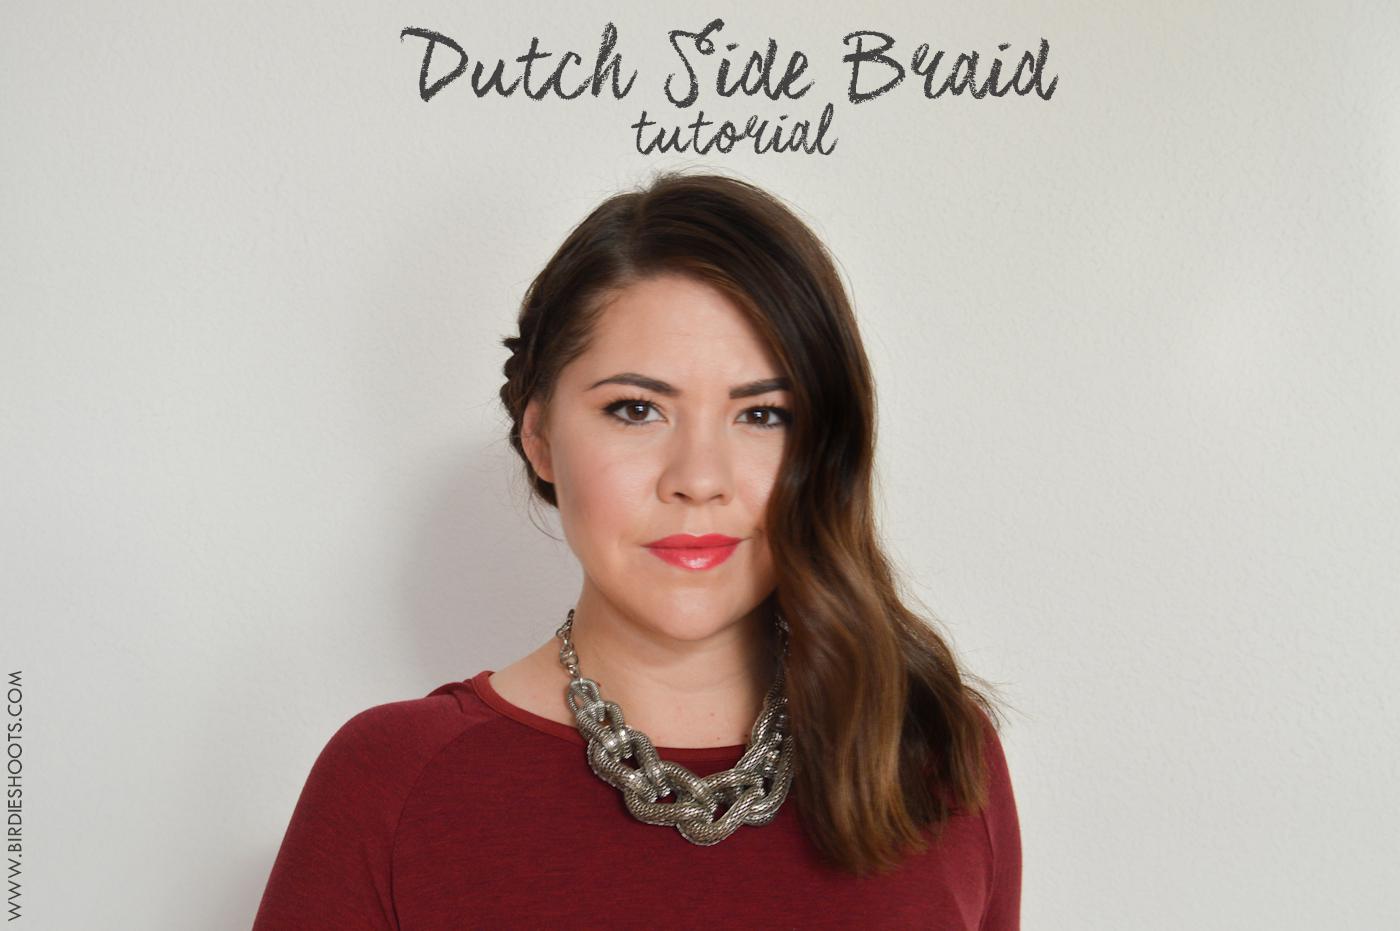 Dutch Side Braid tutorial via. Birdie Shoots